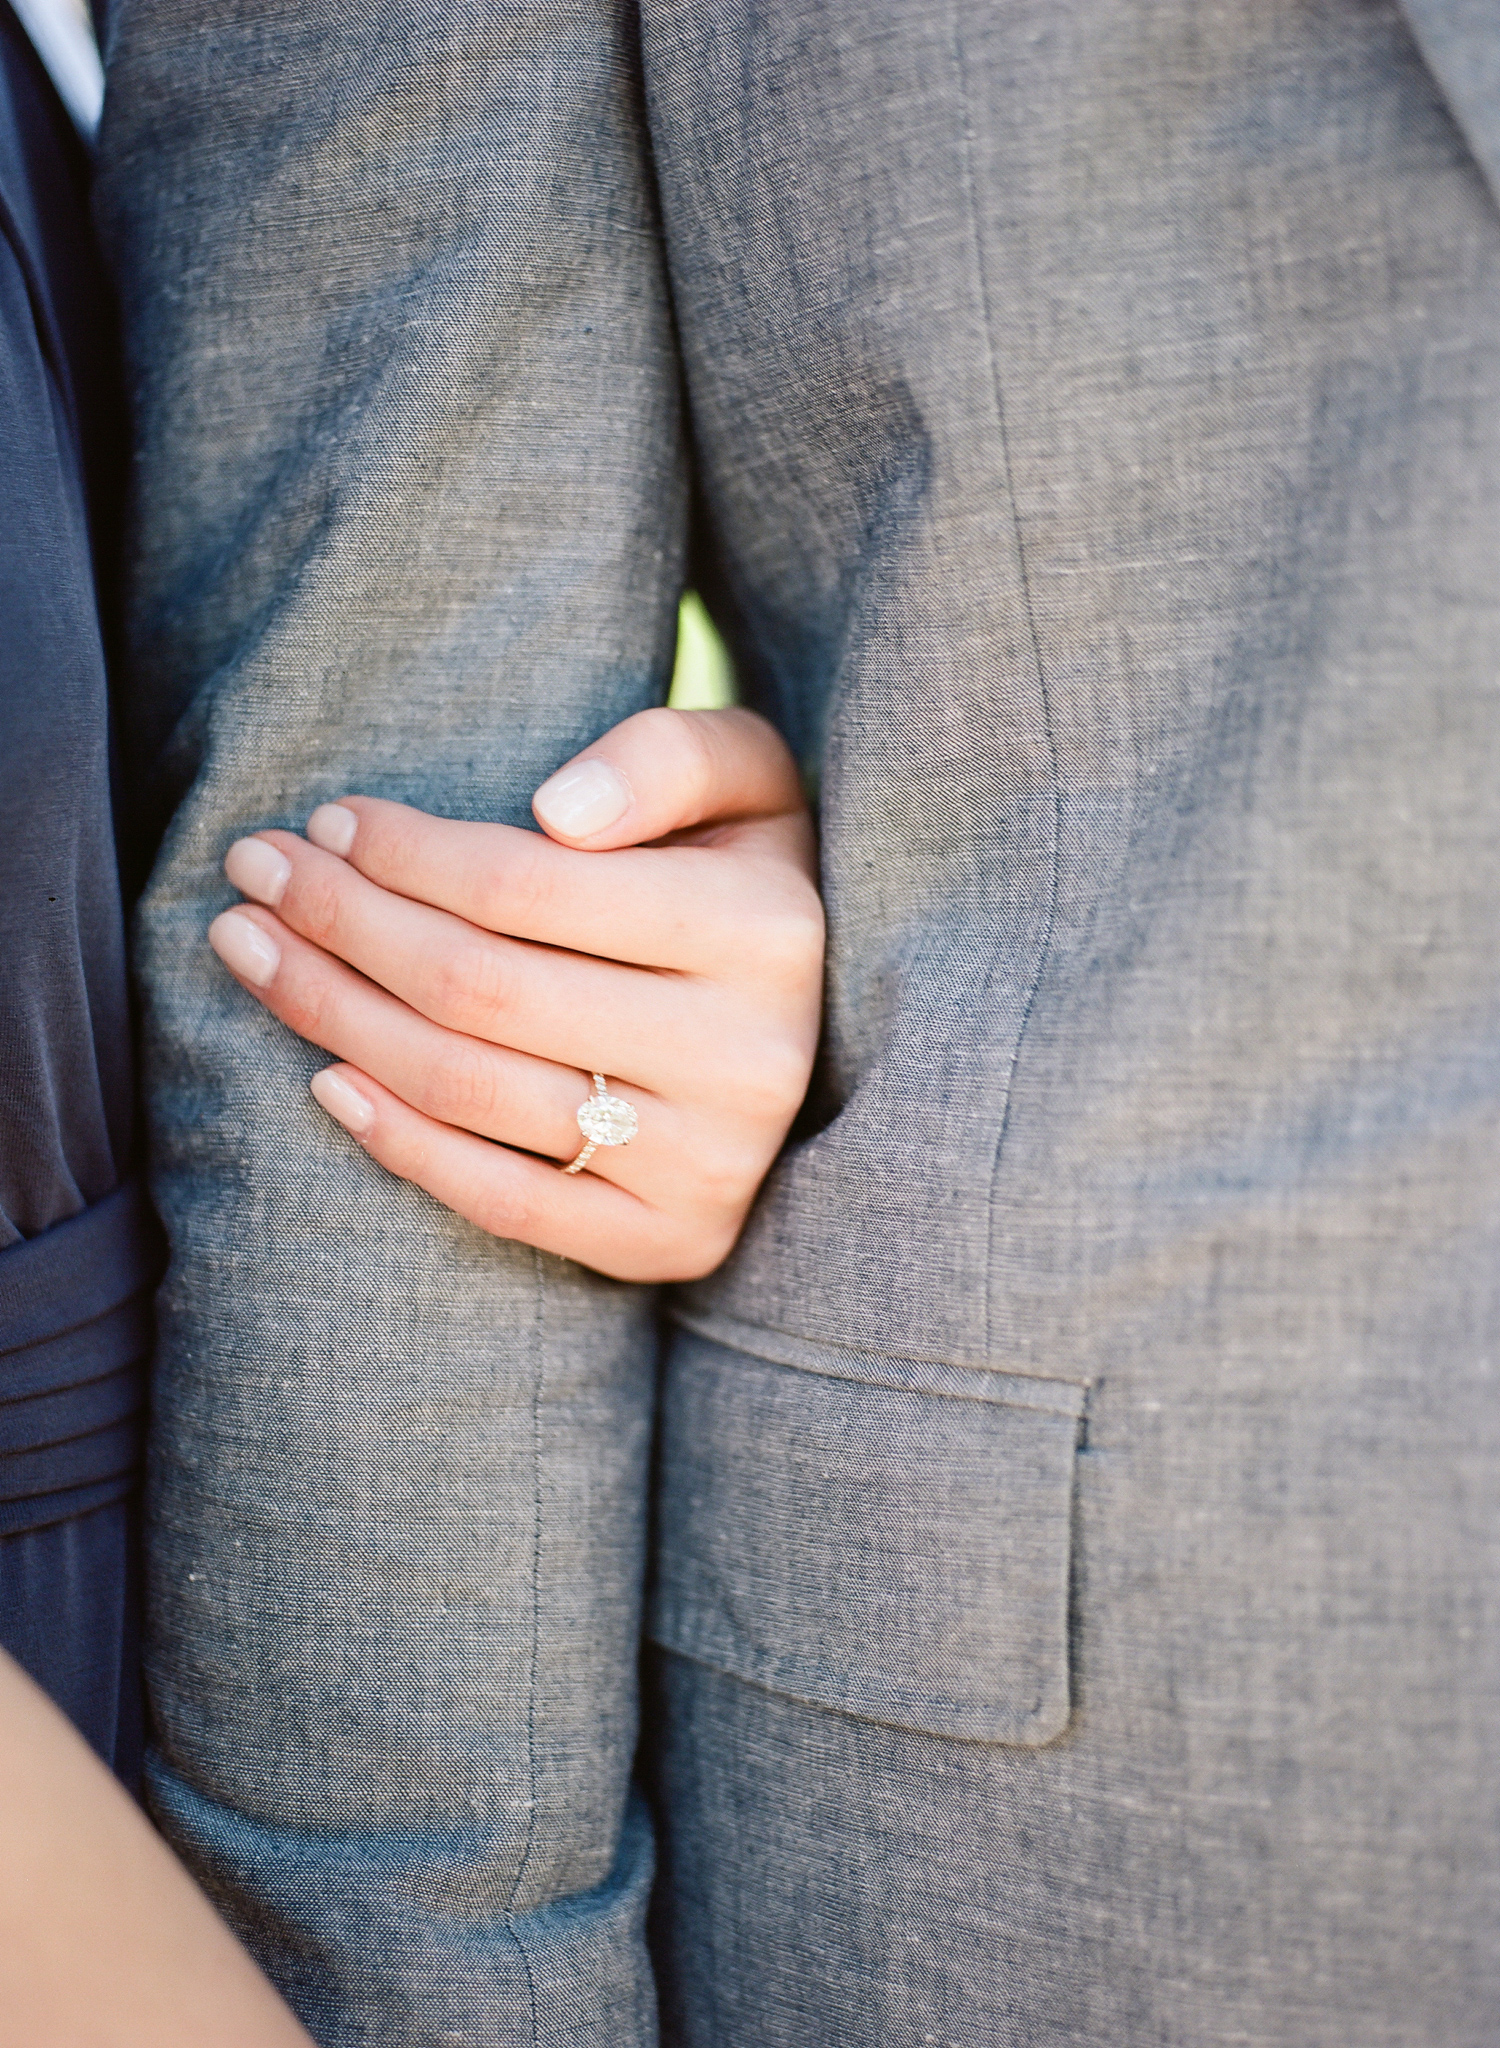 031-Jen-Wojcik-Photography-San-Diego-Wedding-Photographer.jpg